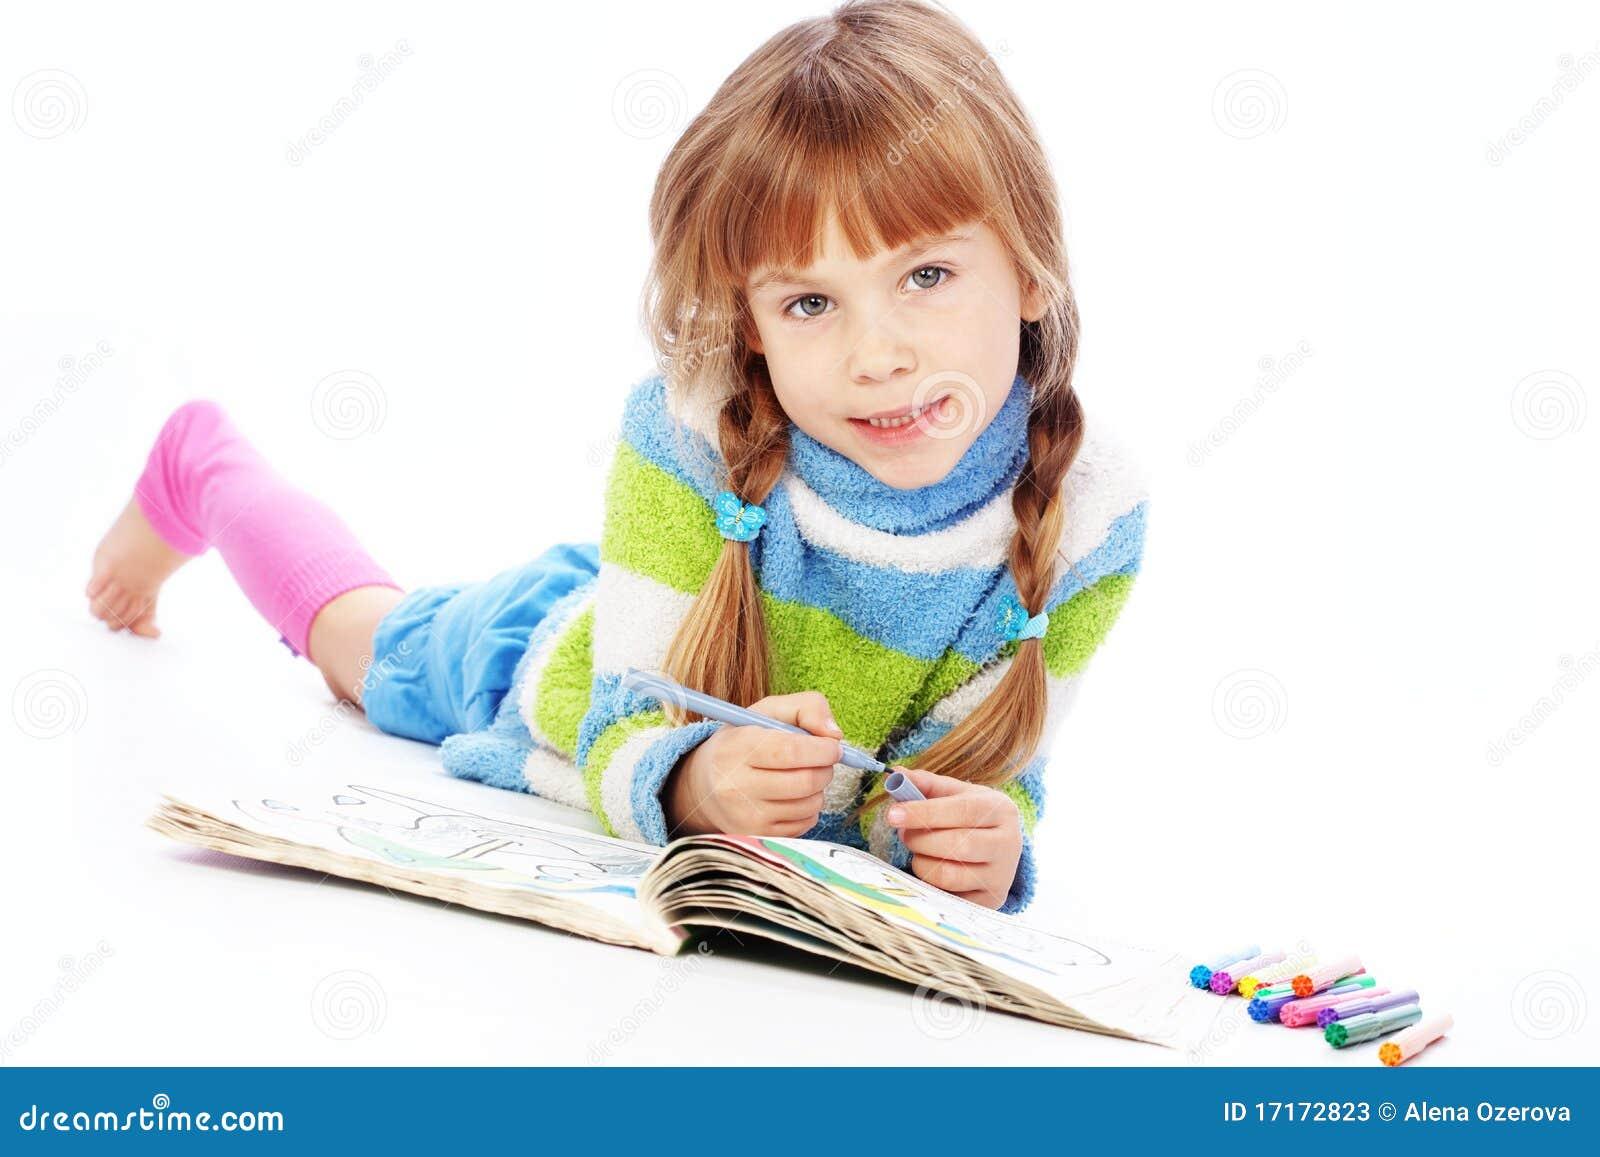 peinture de petite fille image stock image du effectuer 17172823. Black Bedroom Furniture Sets. Home Design Ideas